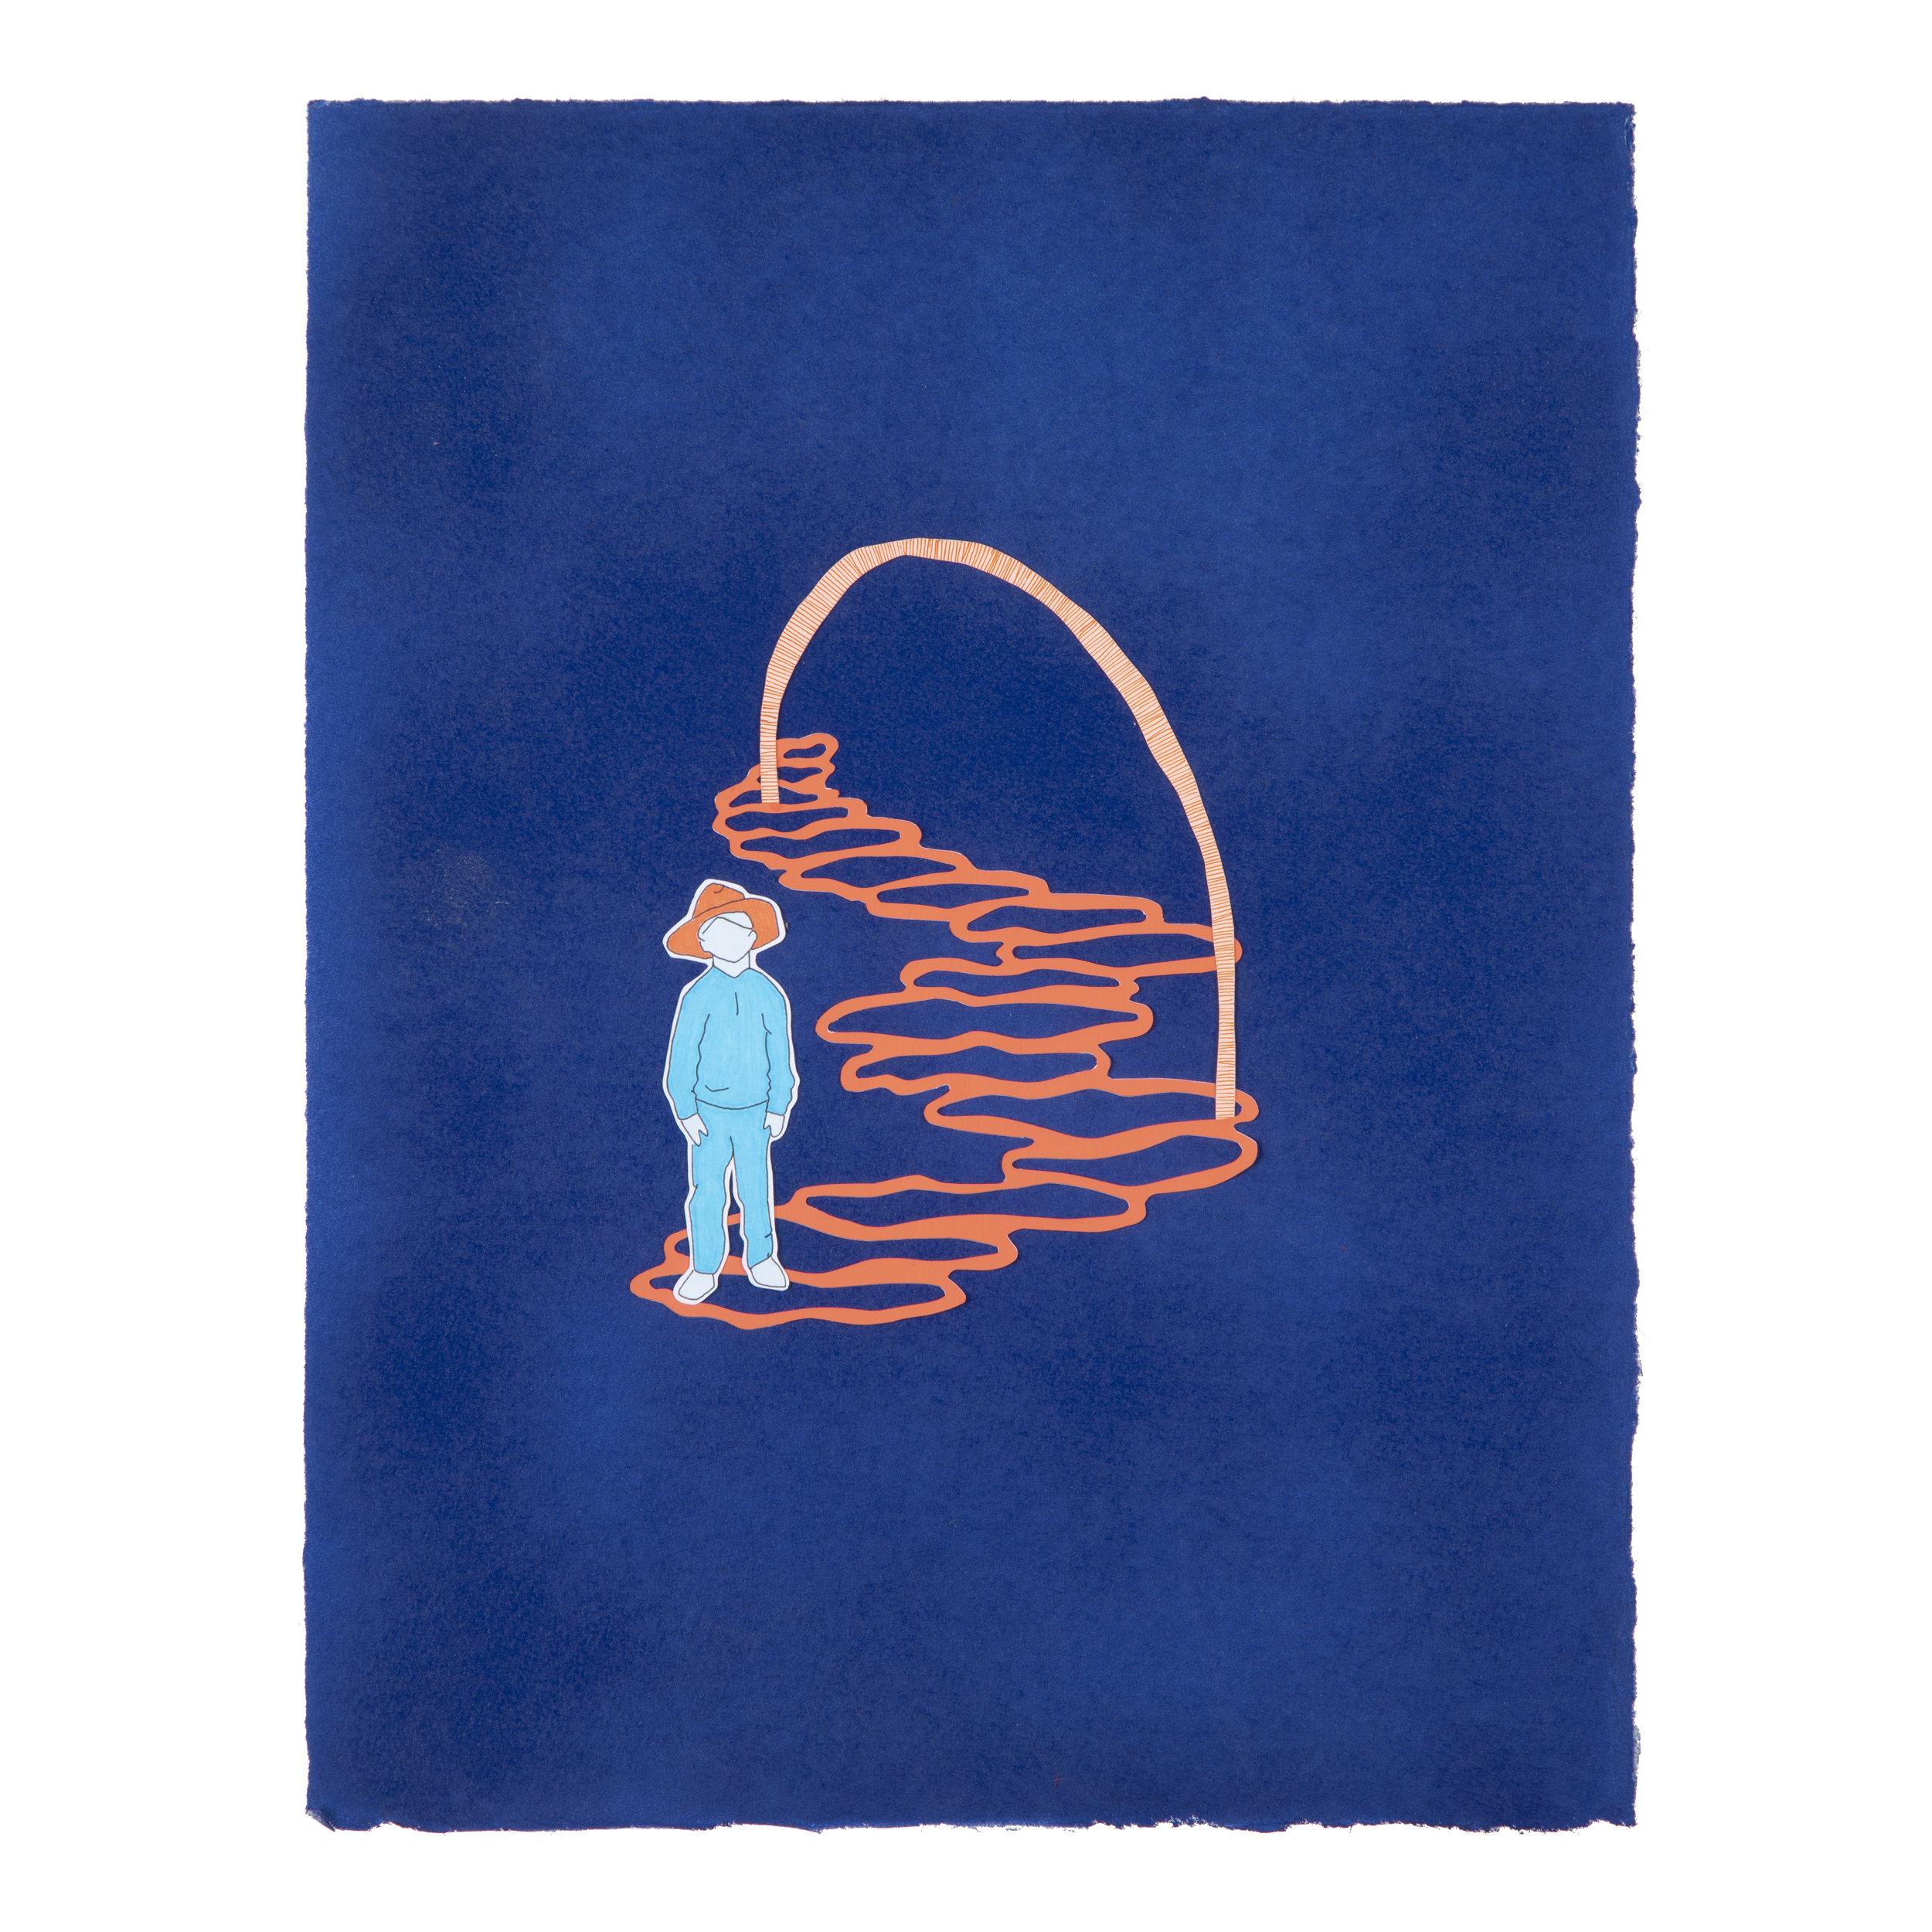 "Cowboy Ed (Orange and Blue 1)   Mixed media on paper, 10"" x 13"", 2019"